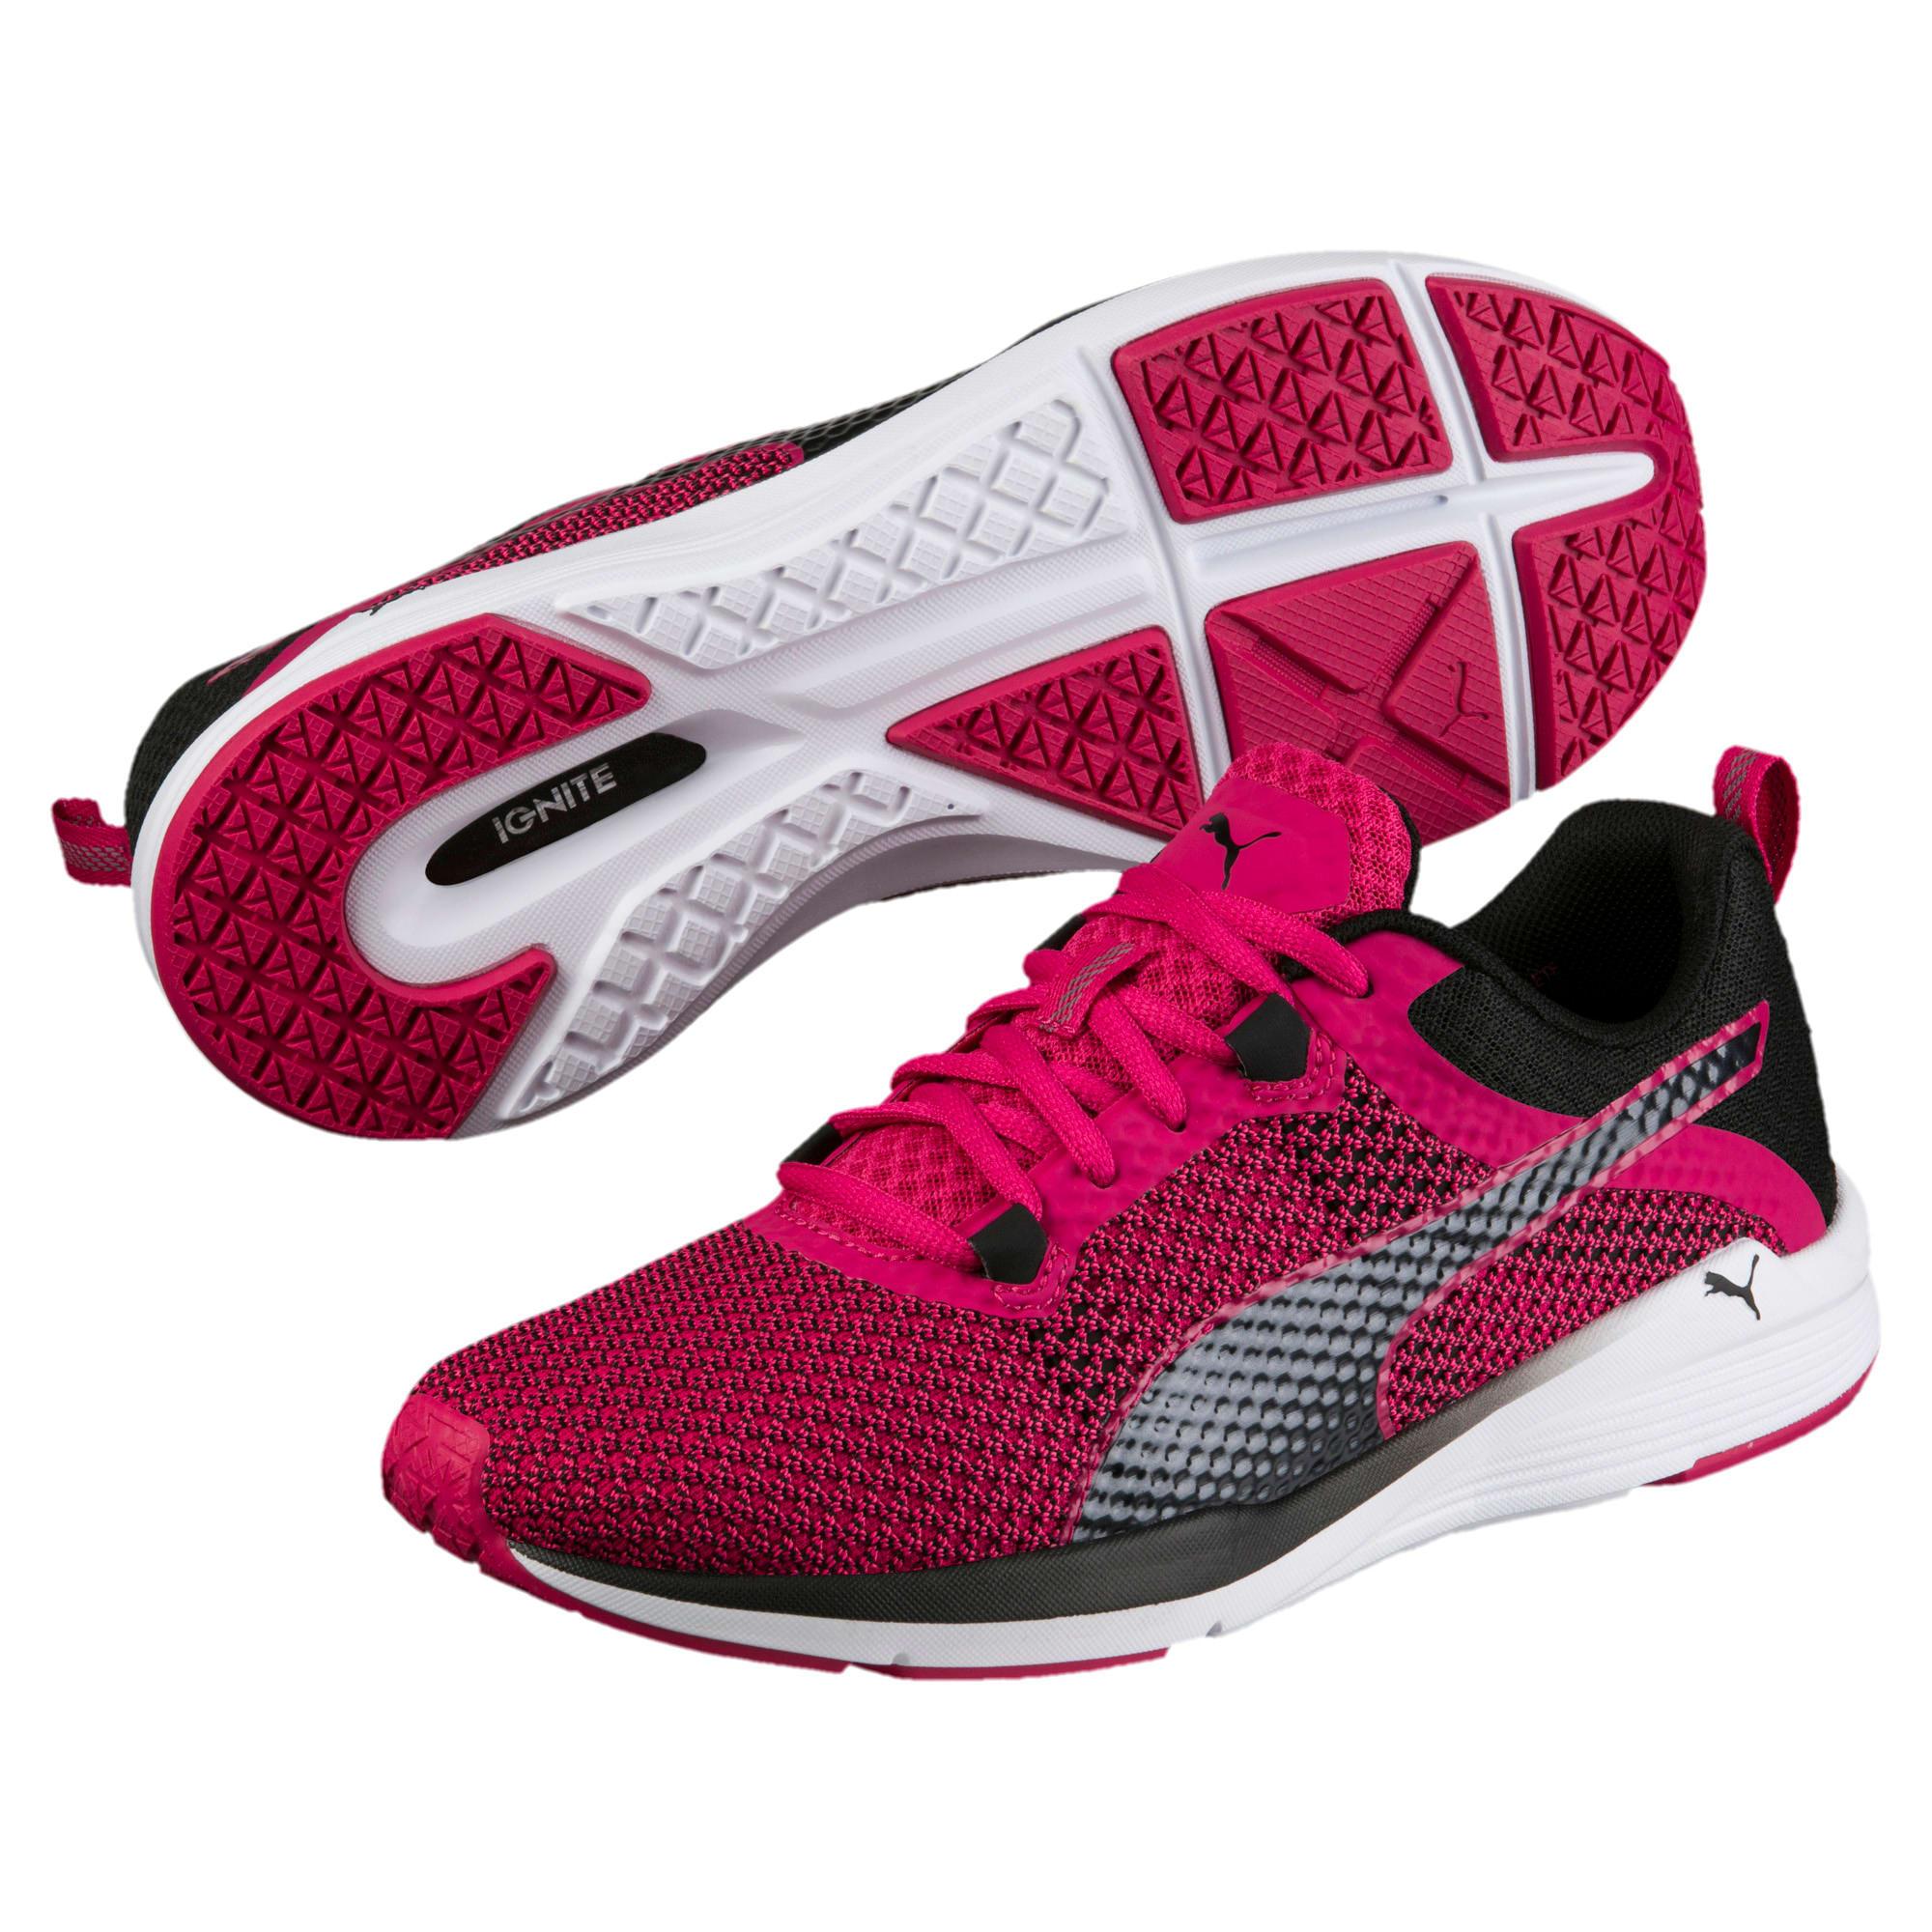 Thumbnail 2 of Pulse IGNITE XT Women's Training Shoes, Love Potion-Puma Black, medium-IND